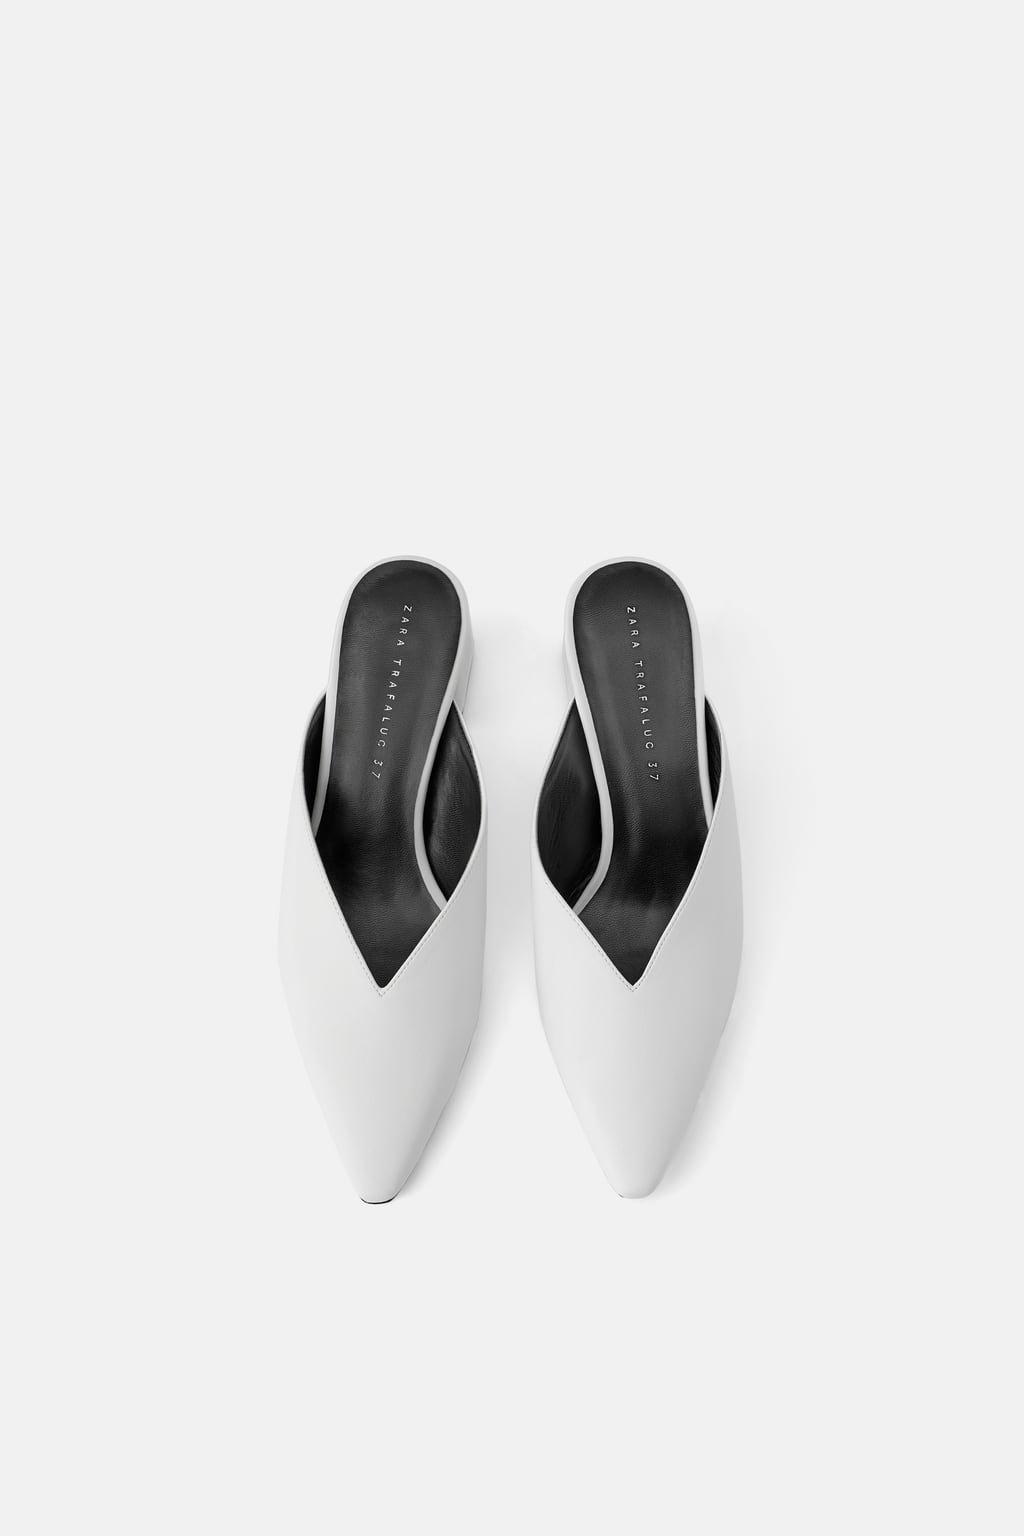 Tacón Mujer Zapatos Zara Mule Escote sQxhrdCt